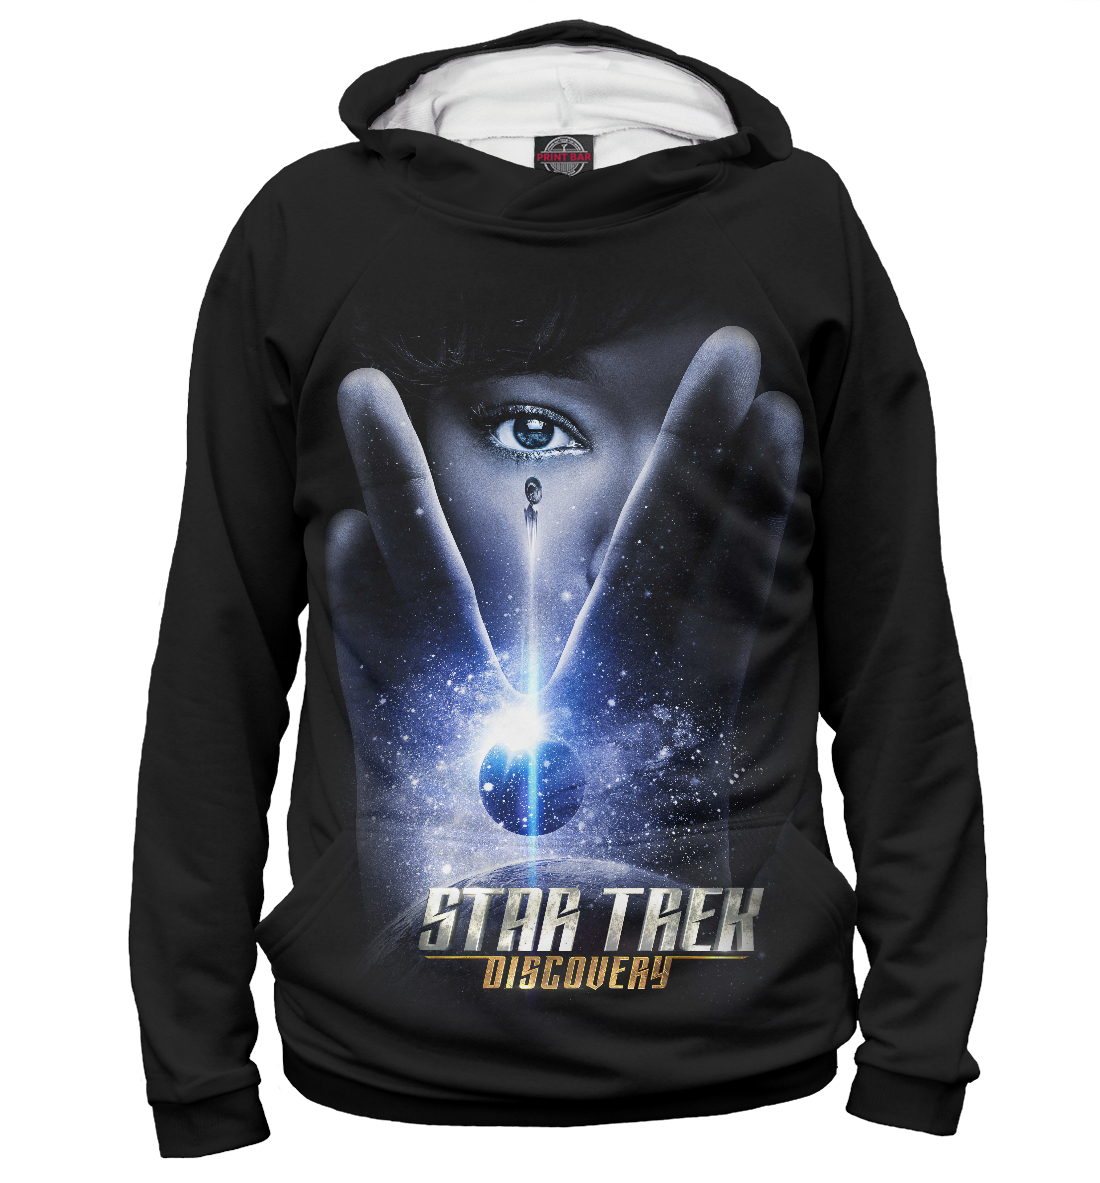 Купить Star Trek: Discovery, Printbar, Худи, SDC-431710-hud-2